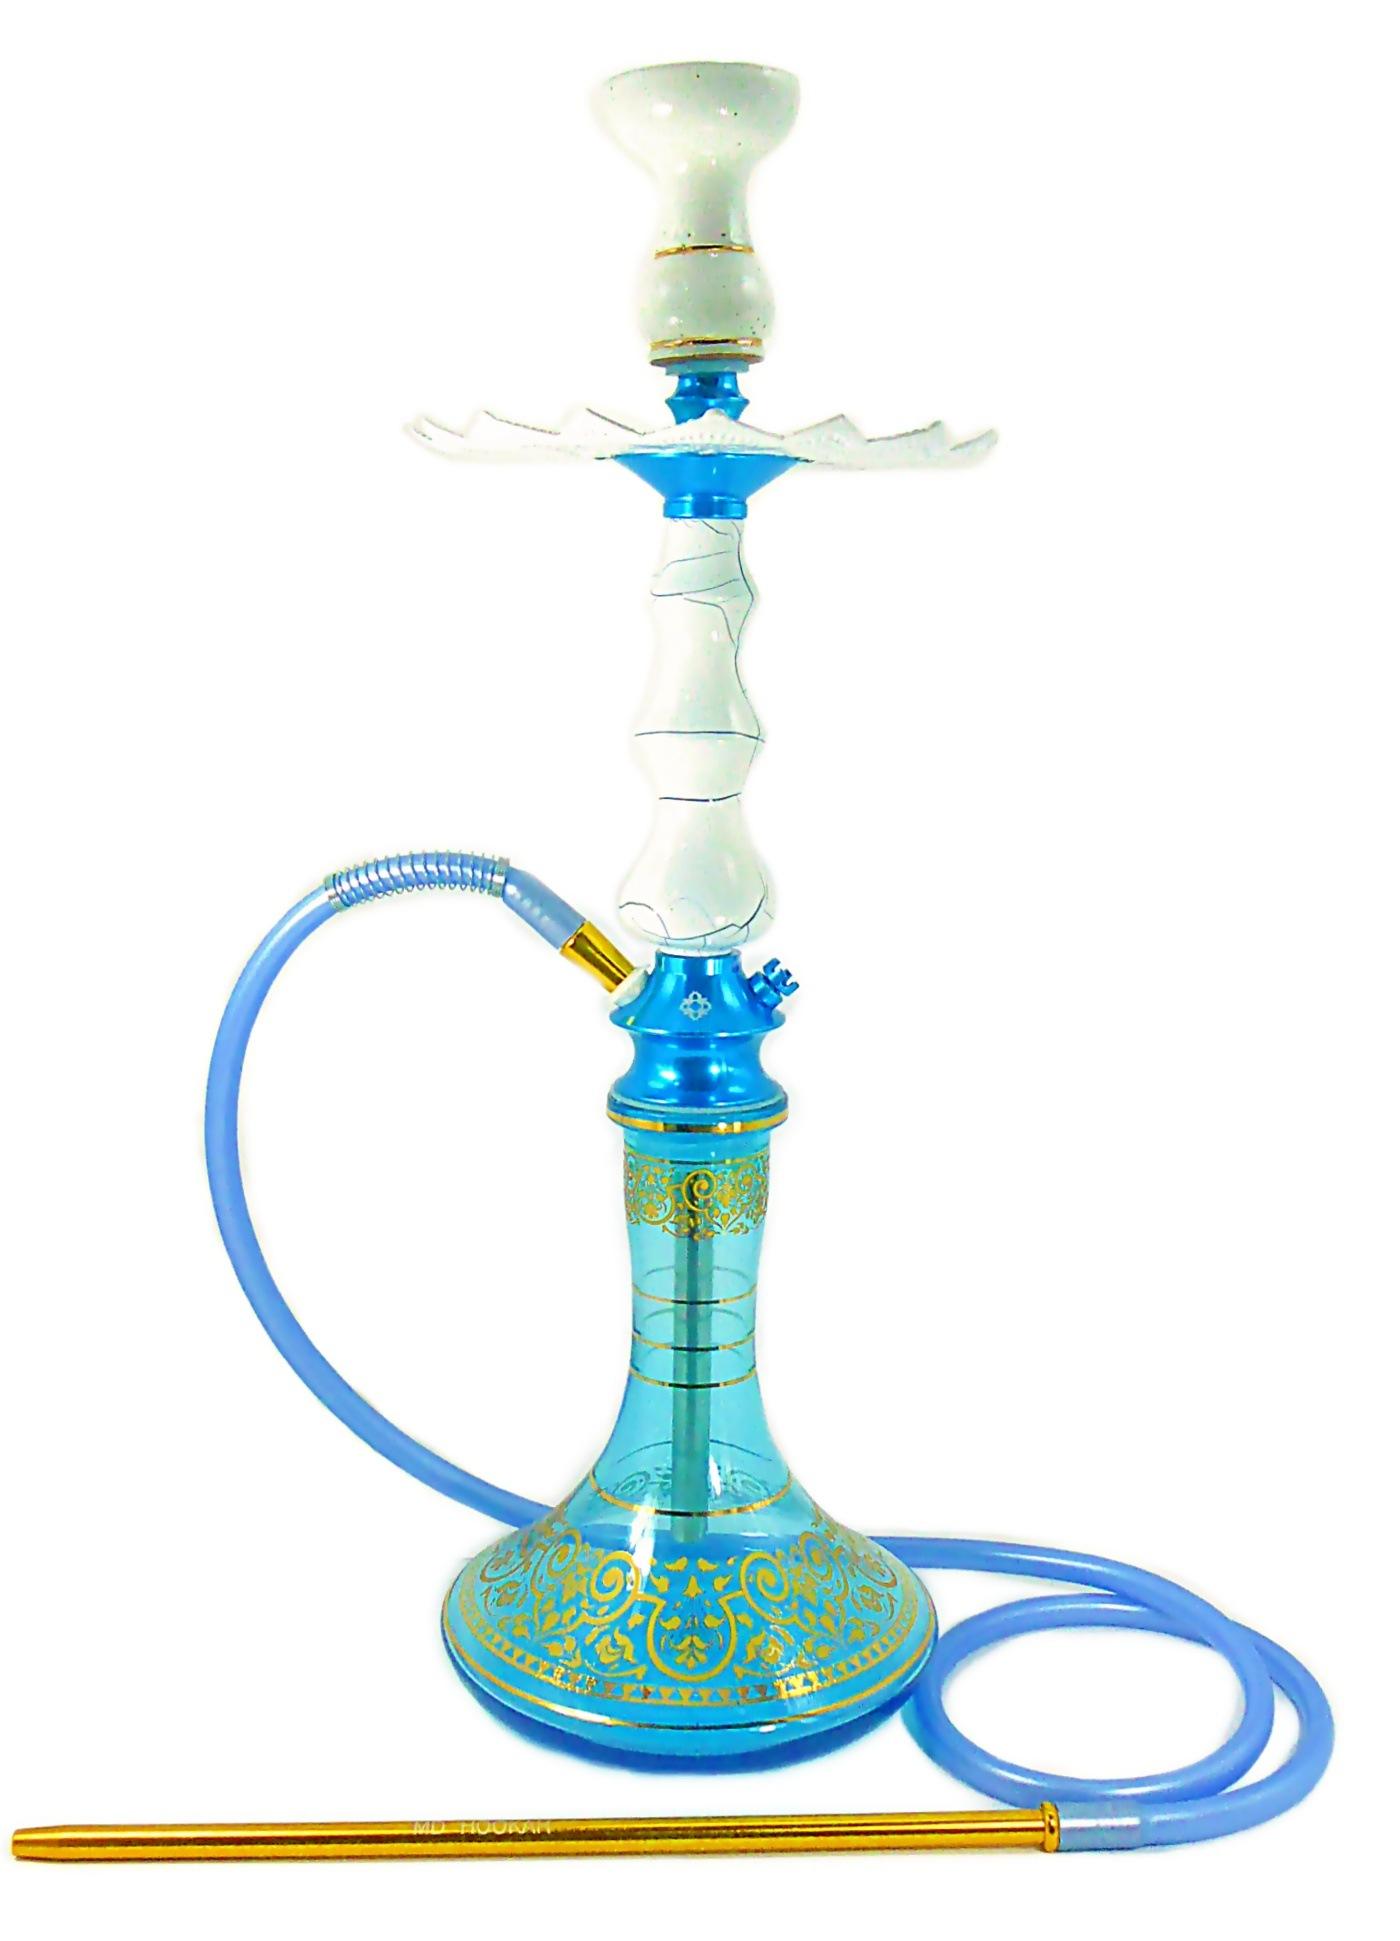 Narguile Amazon Pride Azul Claro / Ônix 65cm, vaso Aladin, mangueira silicone, piteira alum., rosh Amazon, prato Malik